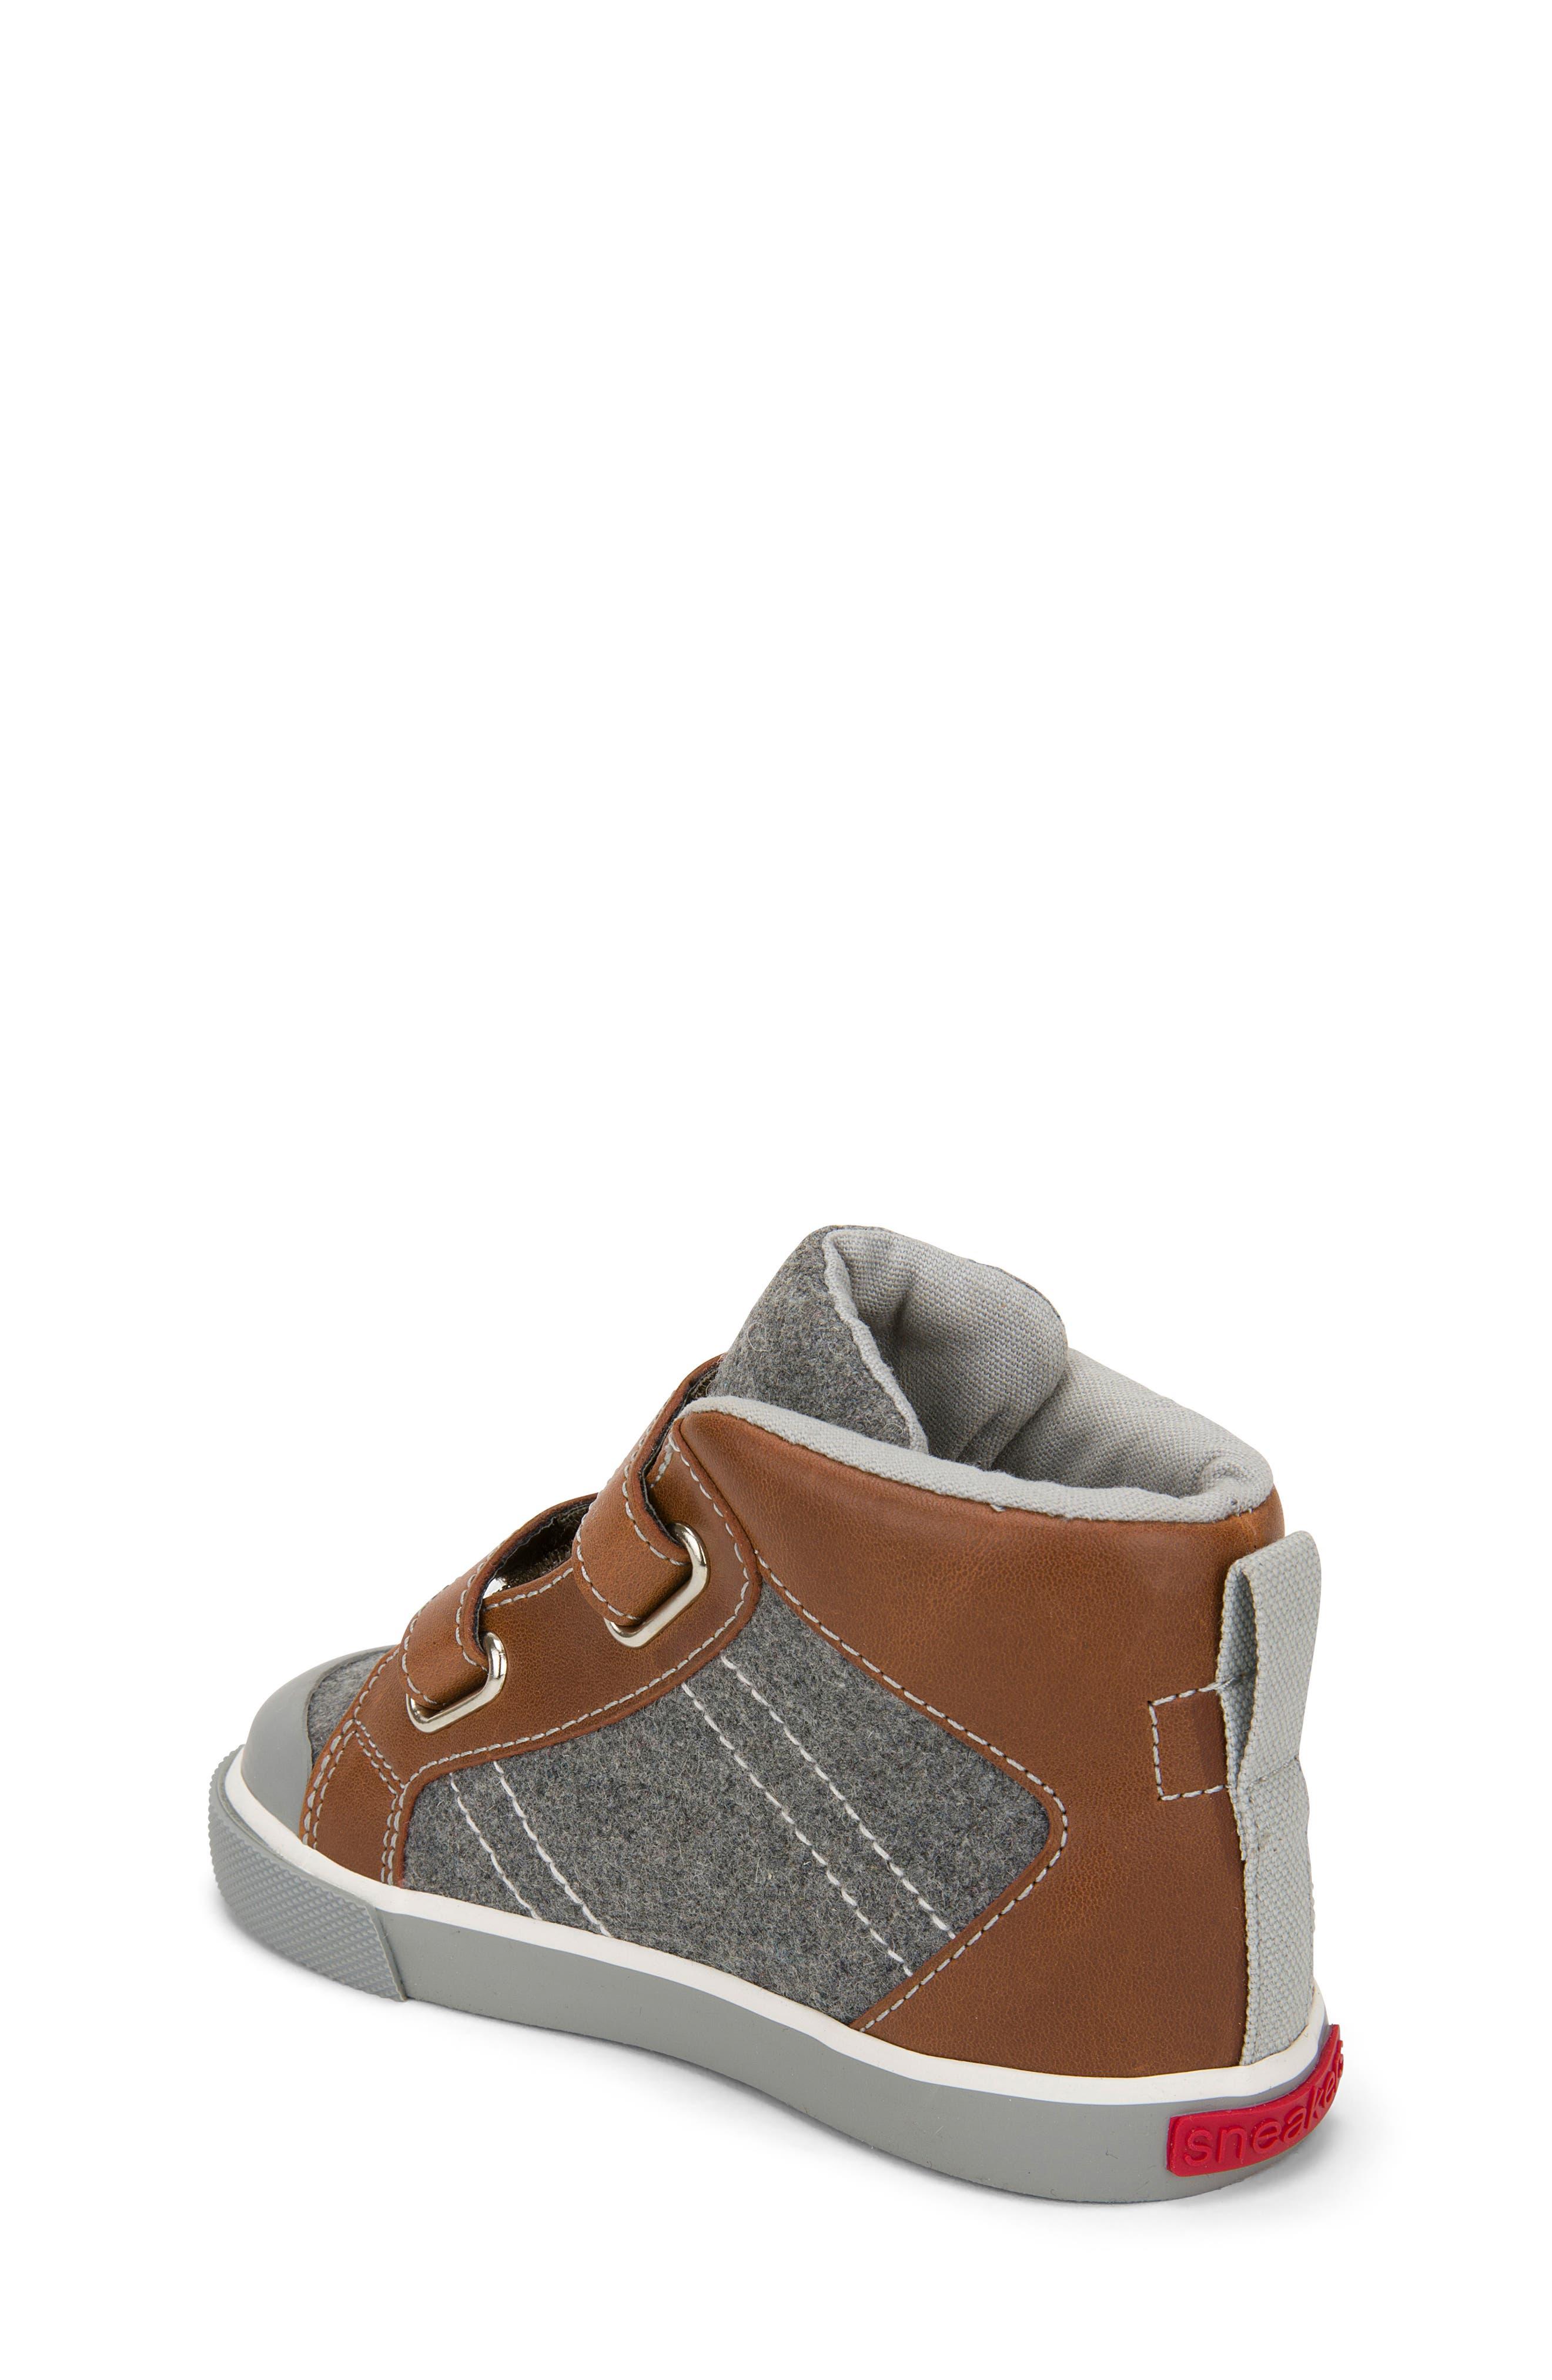 Matty Sneaker,                             Alternate thumbnail 2, color,                             Gray Felt